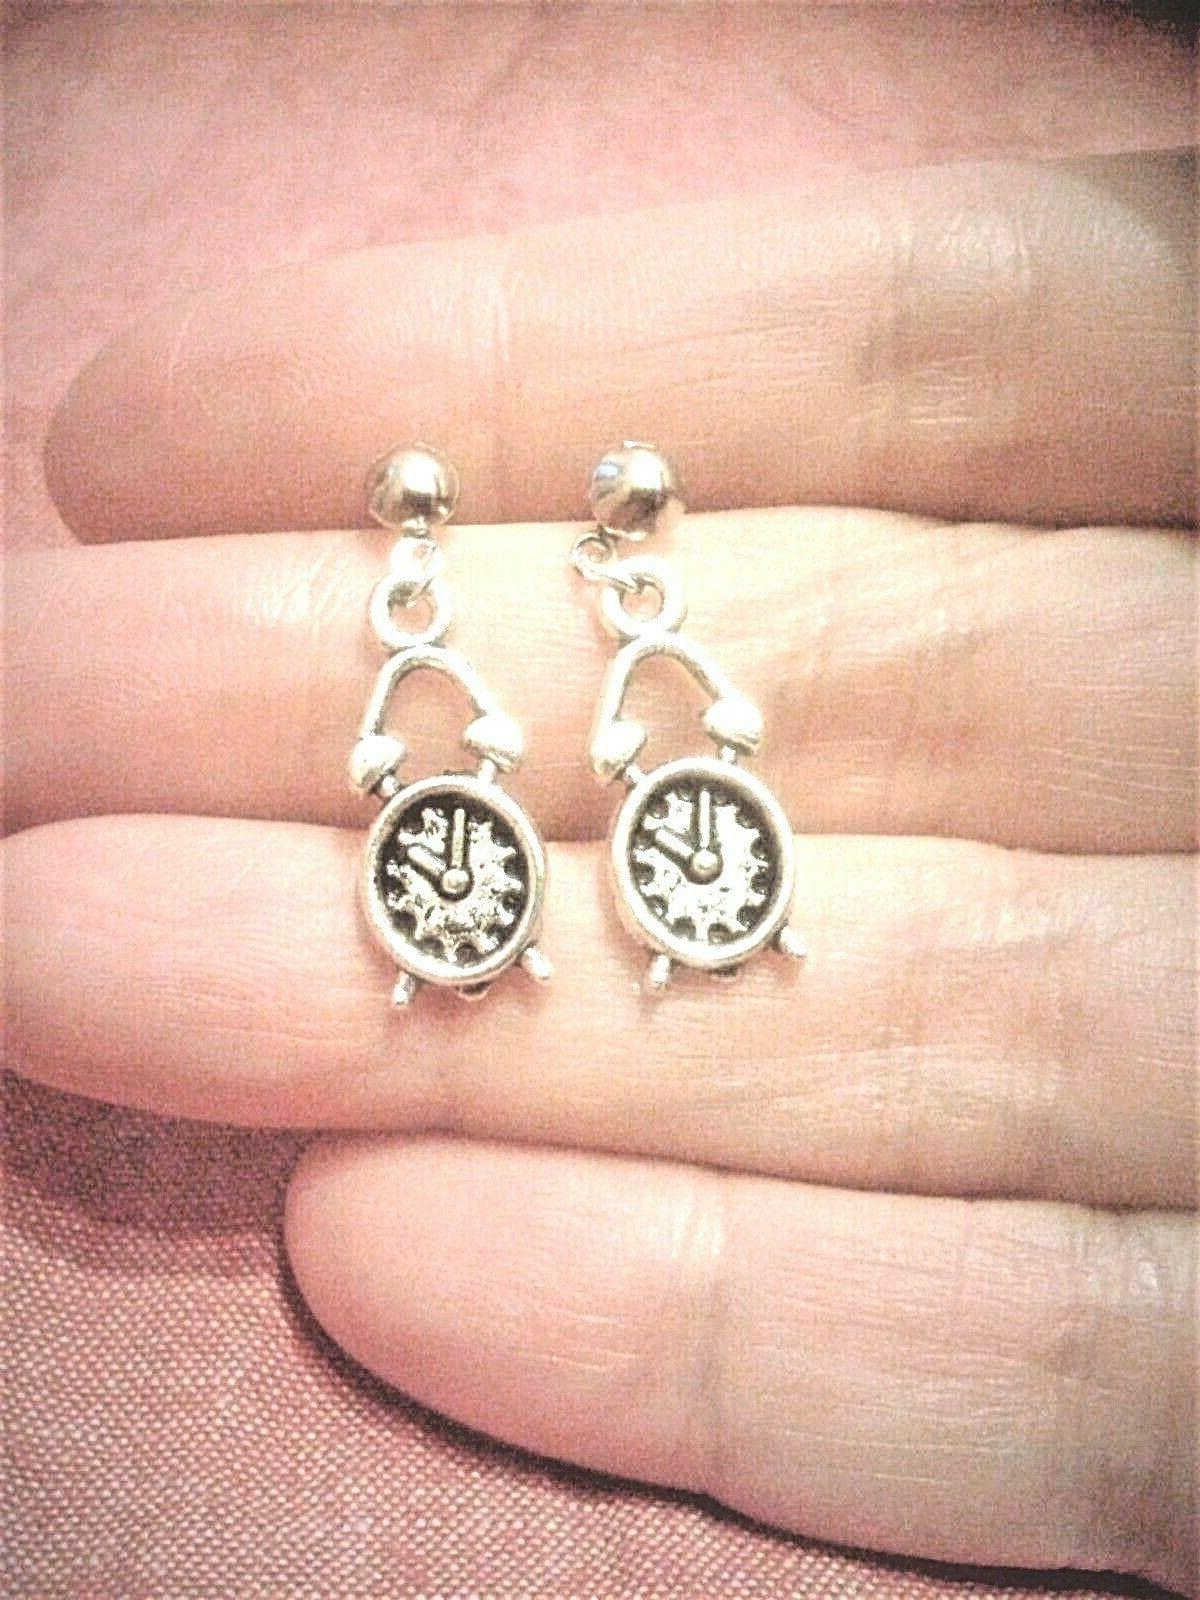 quirky steampunk alarm clock charm earrings boho